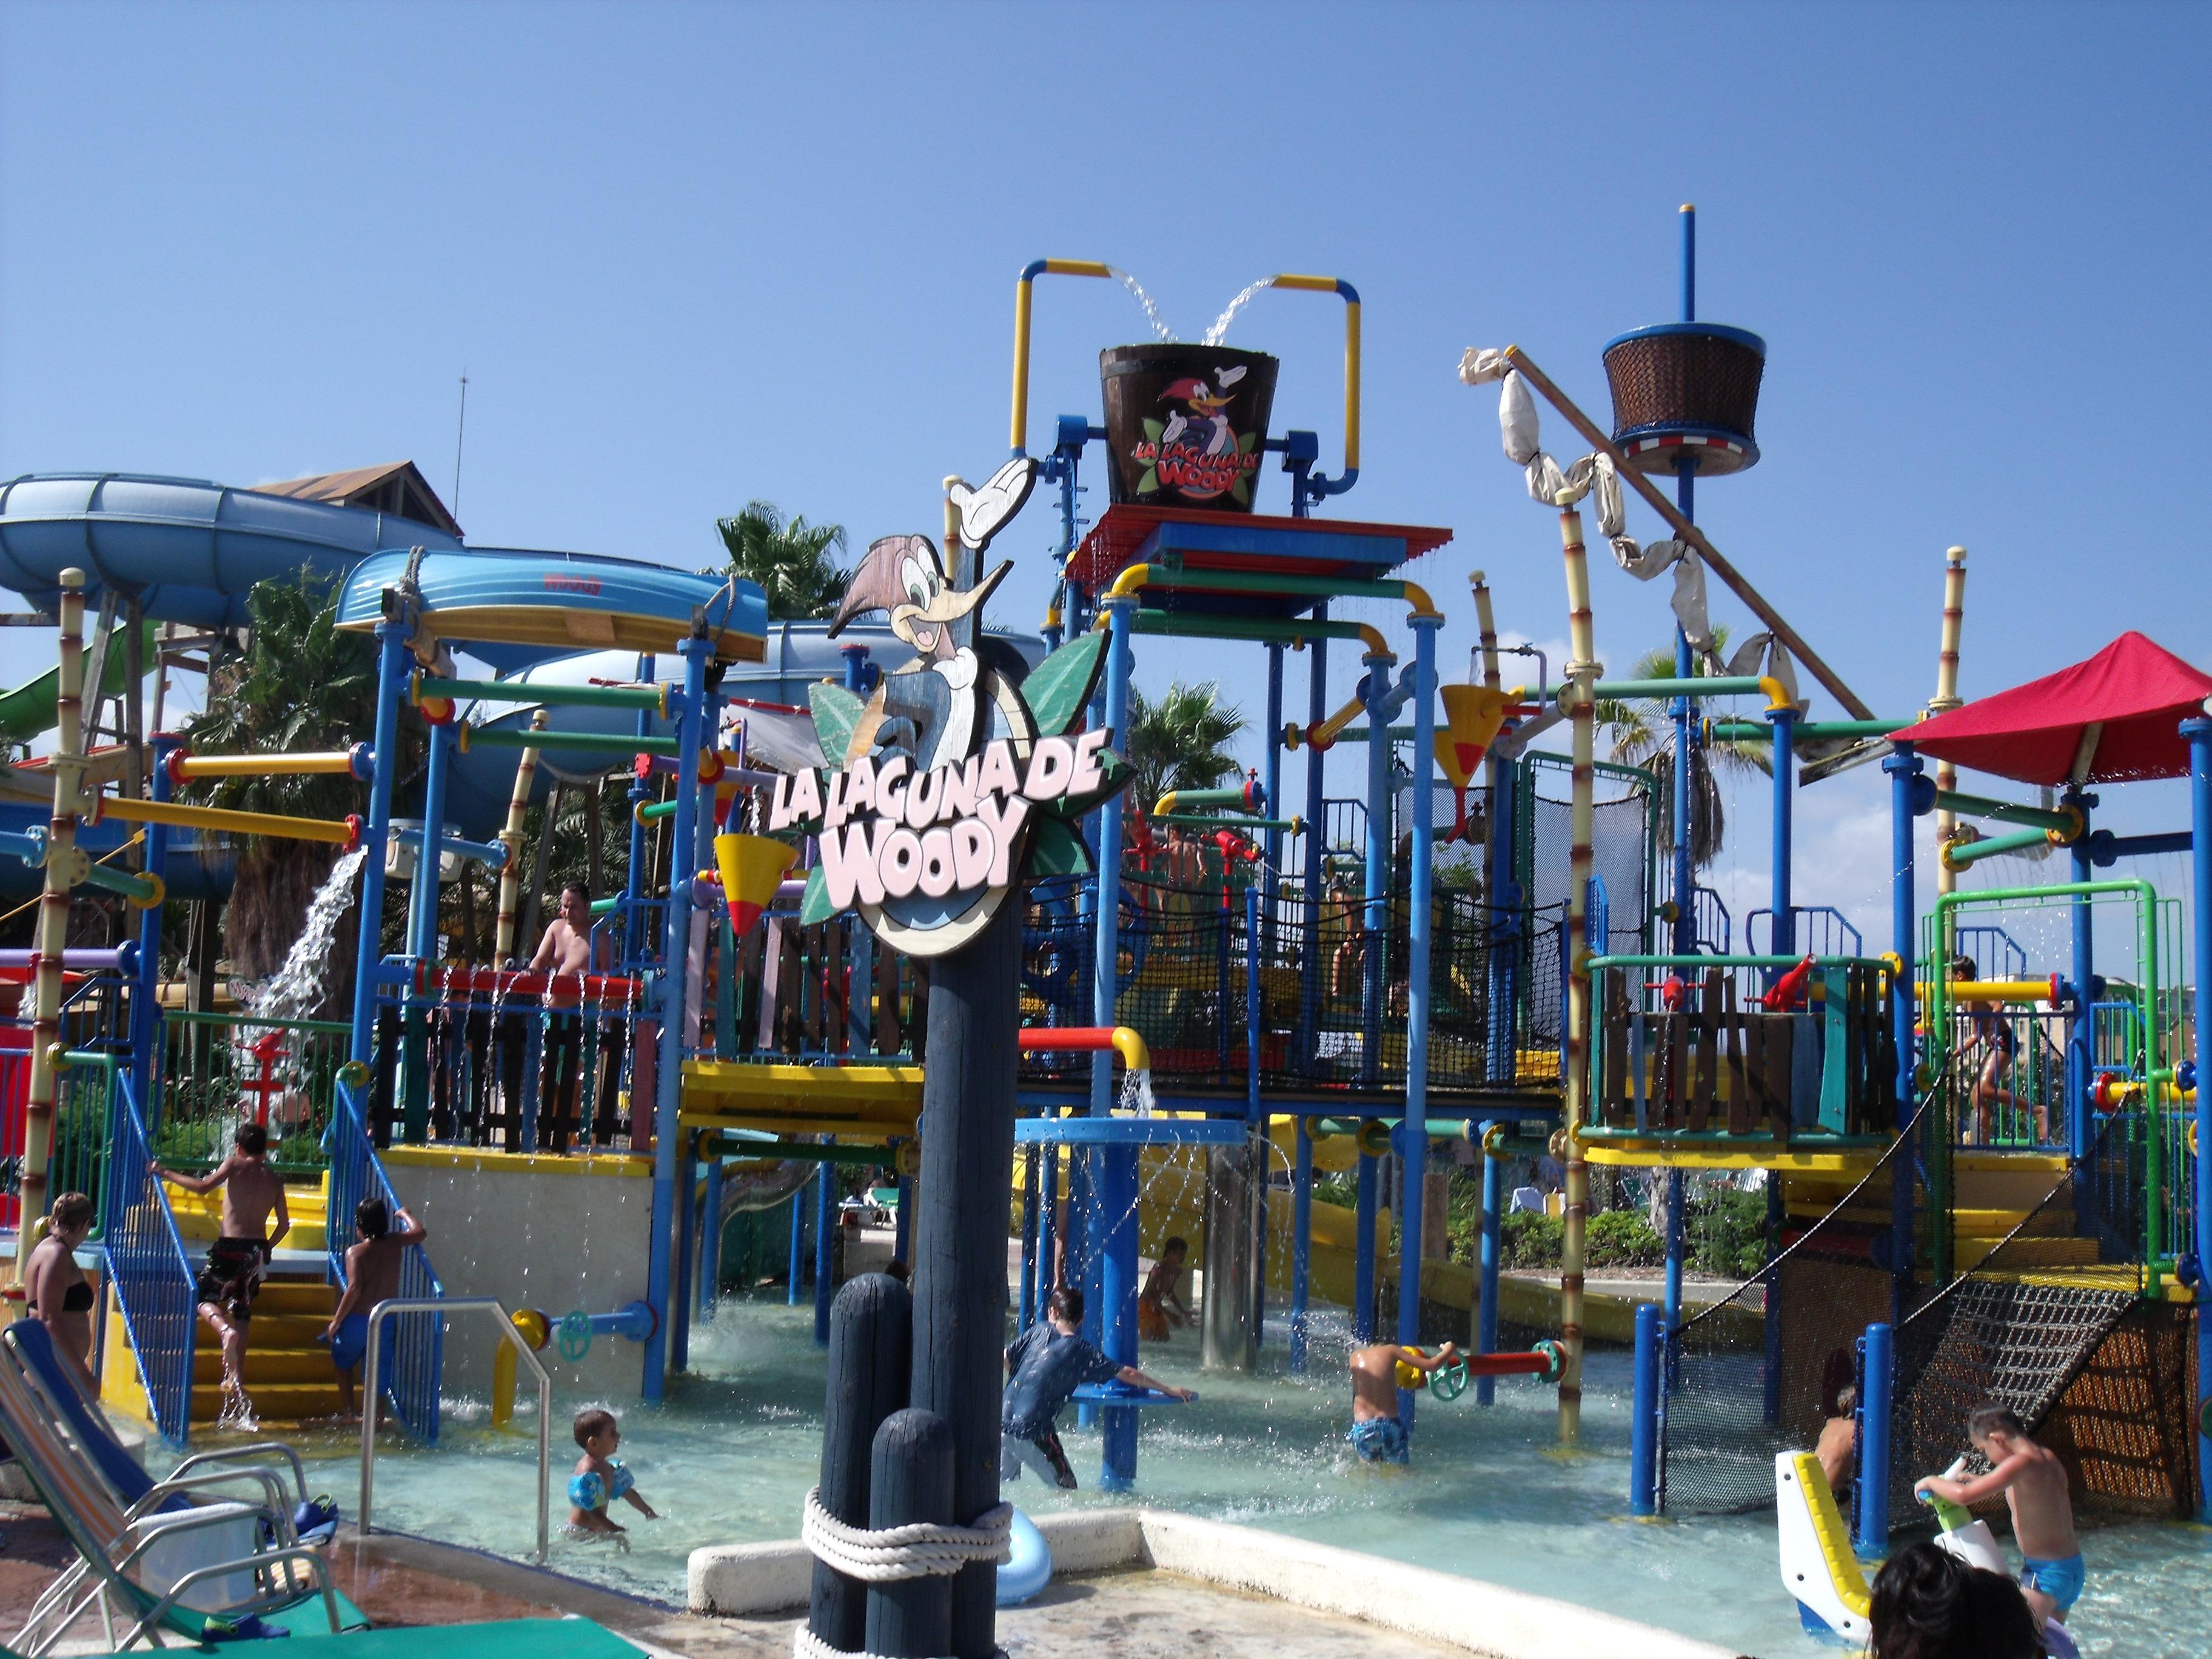 Laguna de Woody water park